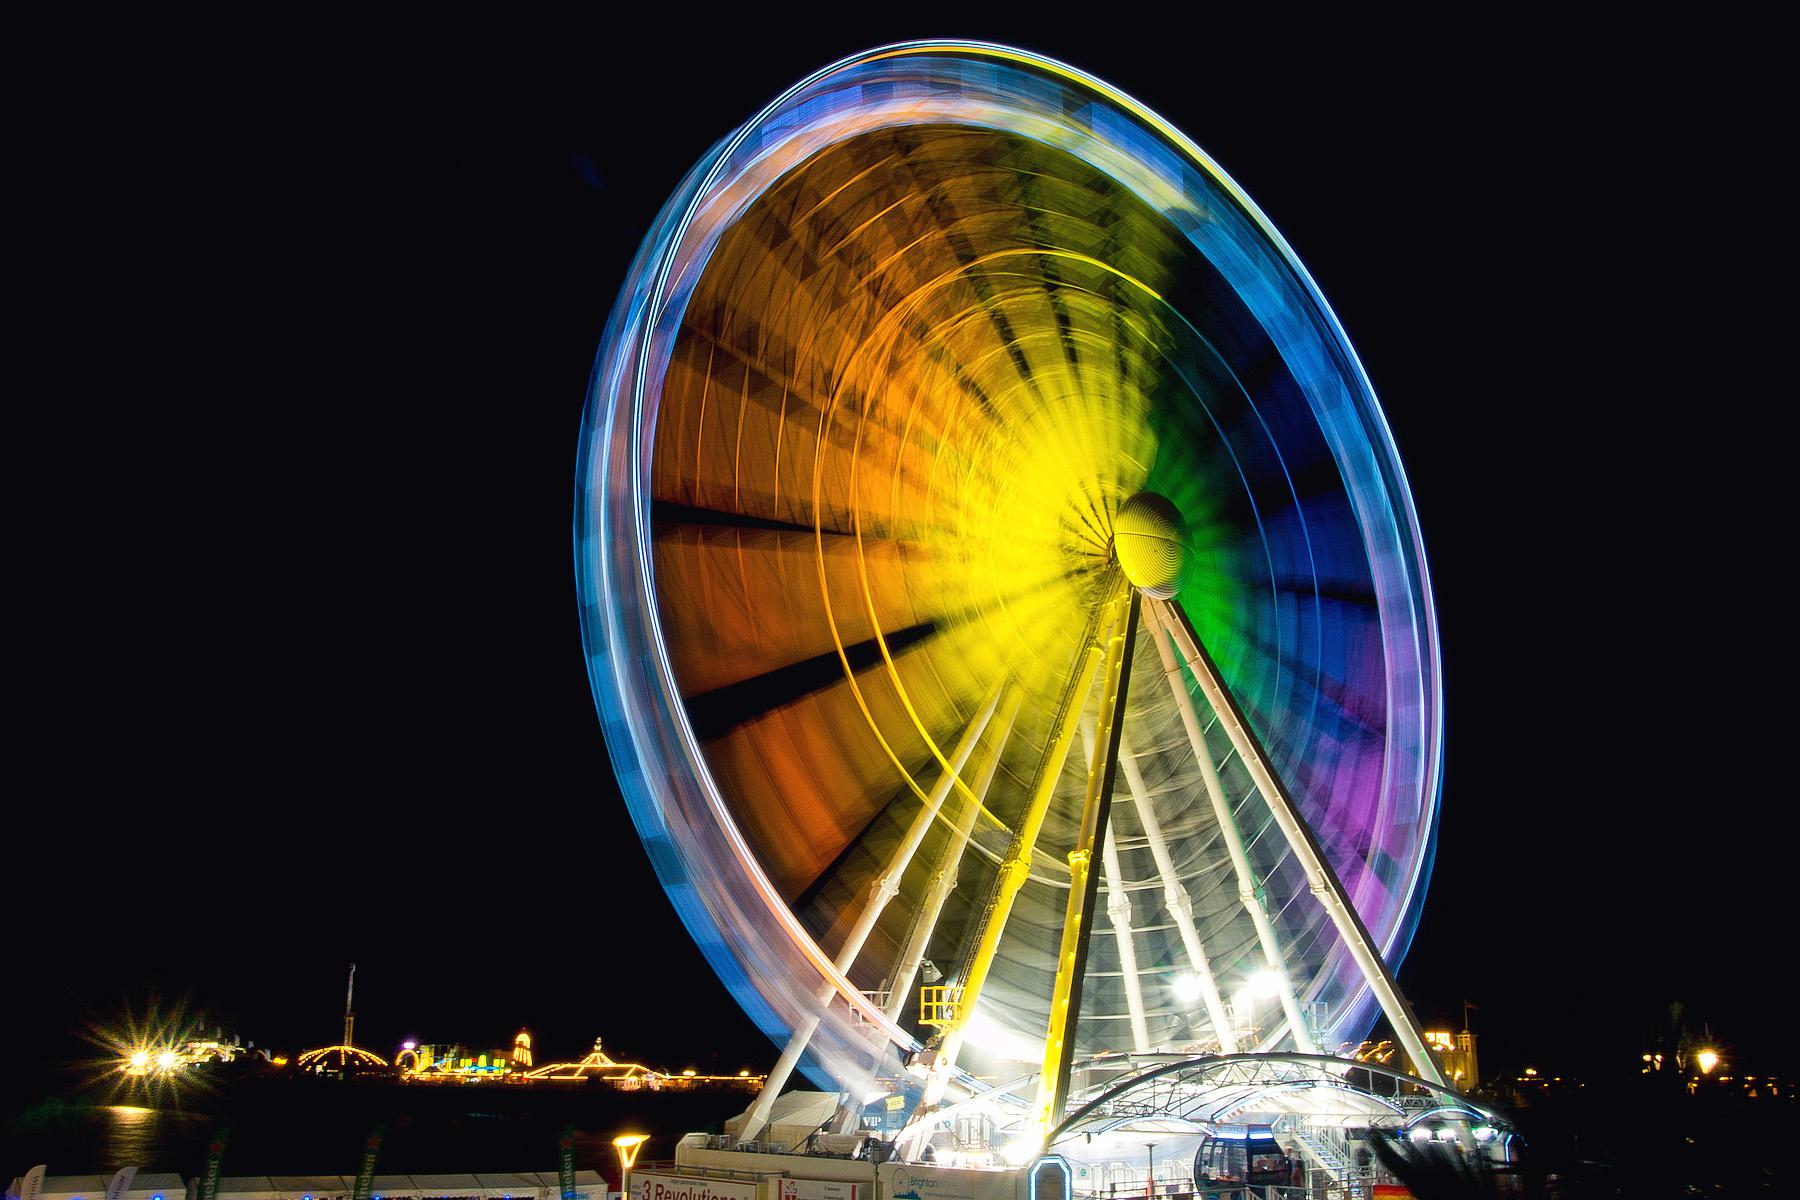 Brighton Wheel, Brighton, East Sussex, England